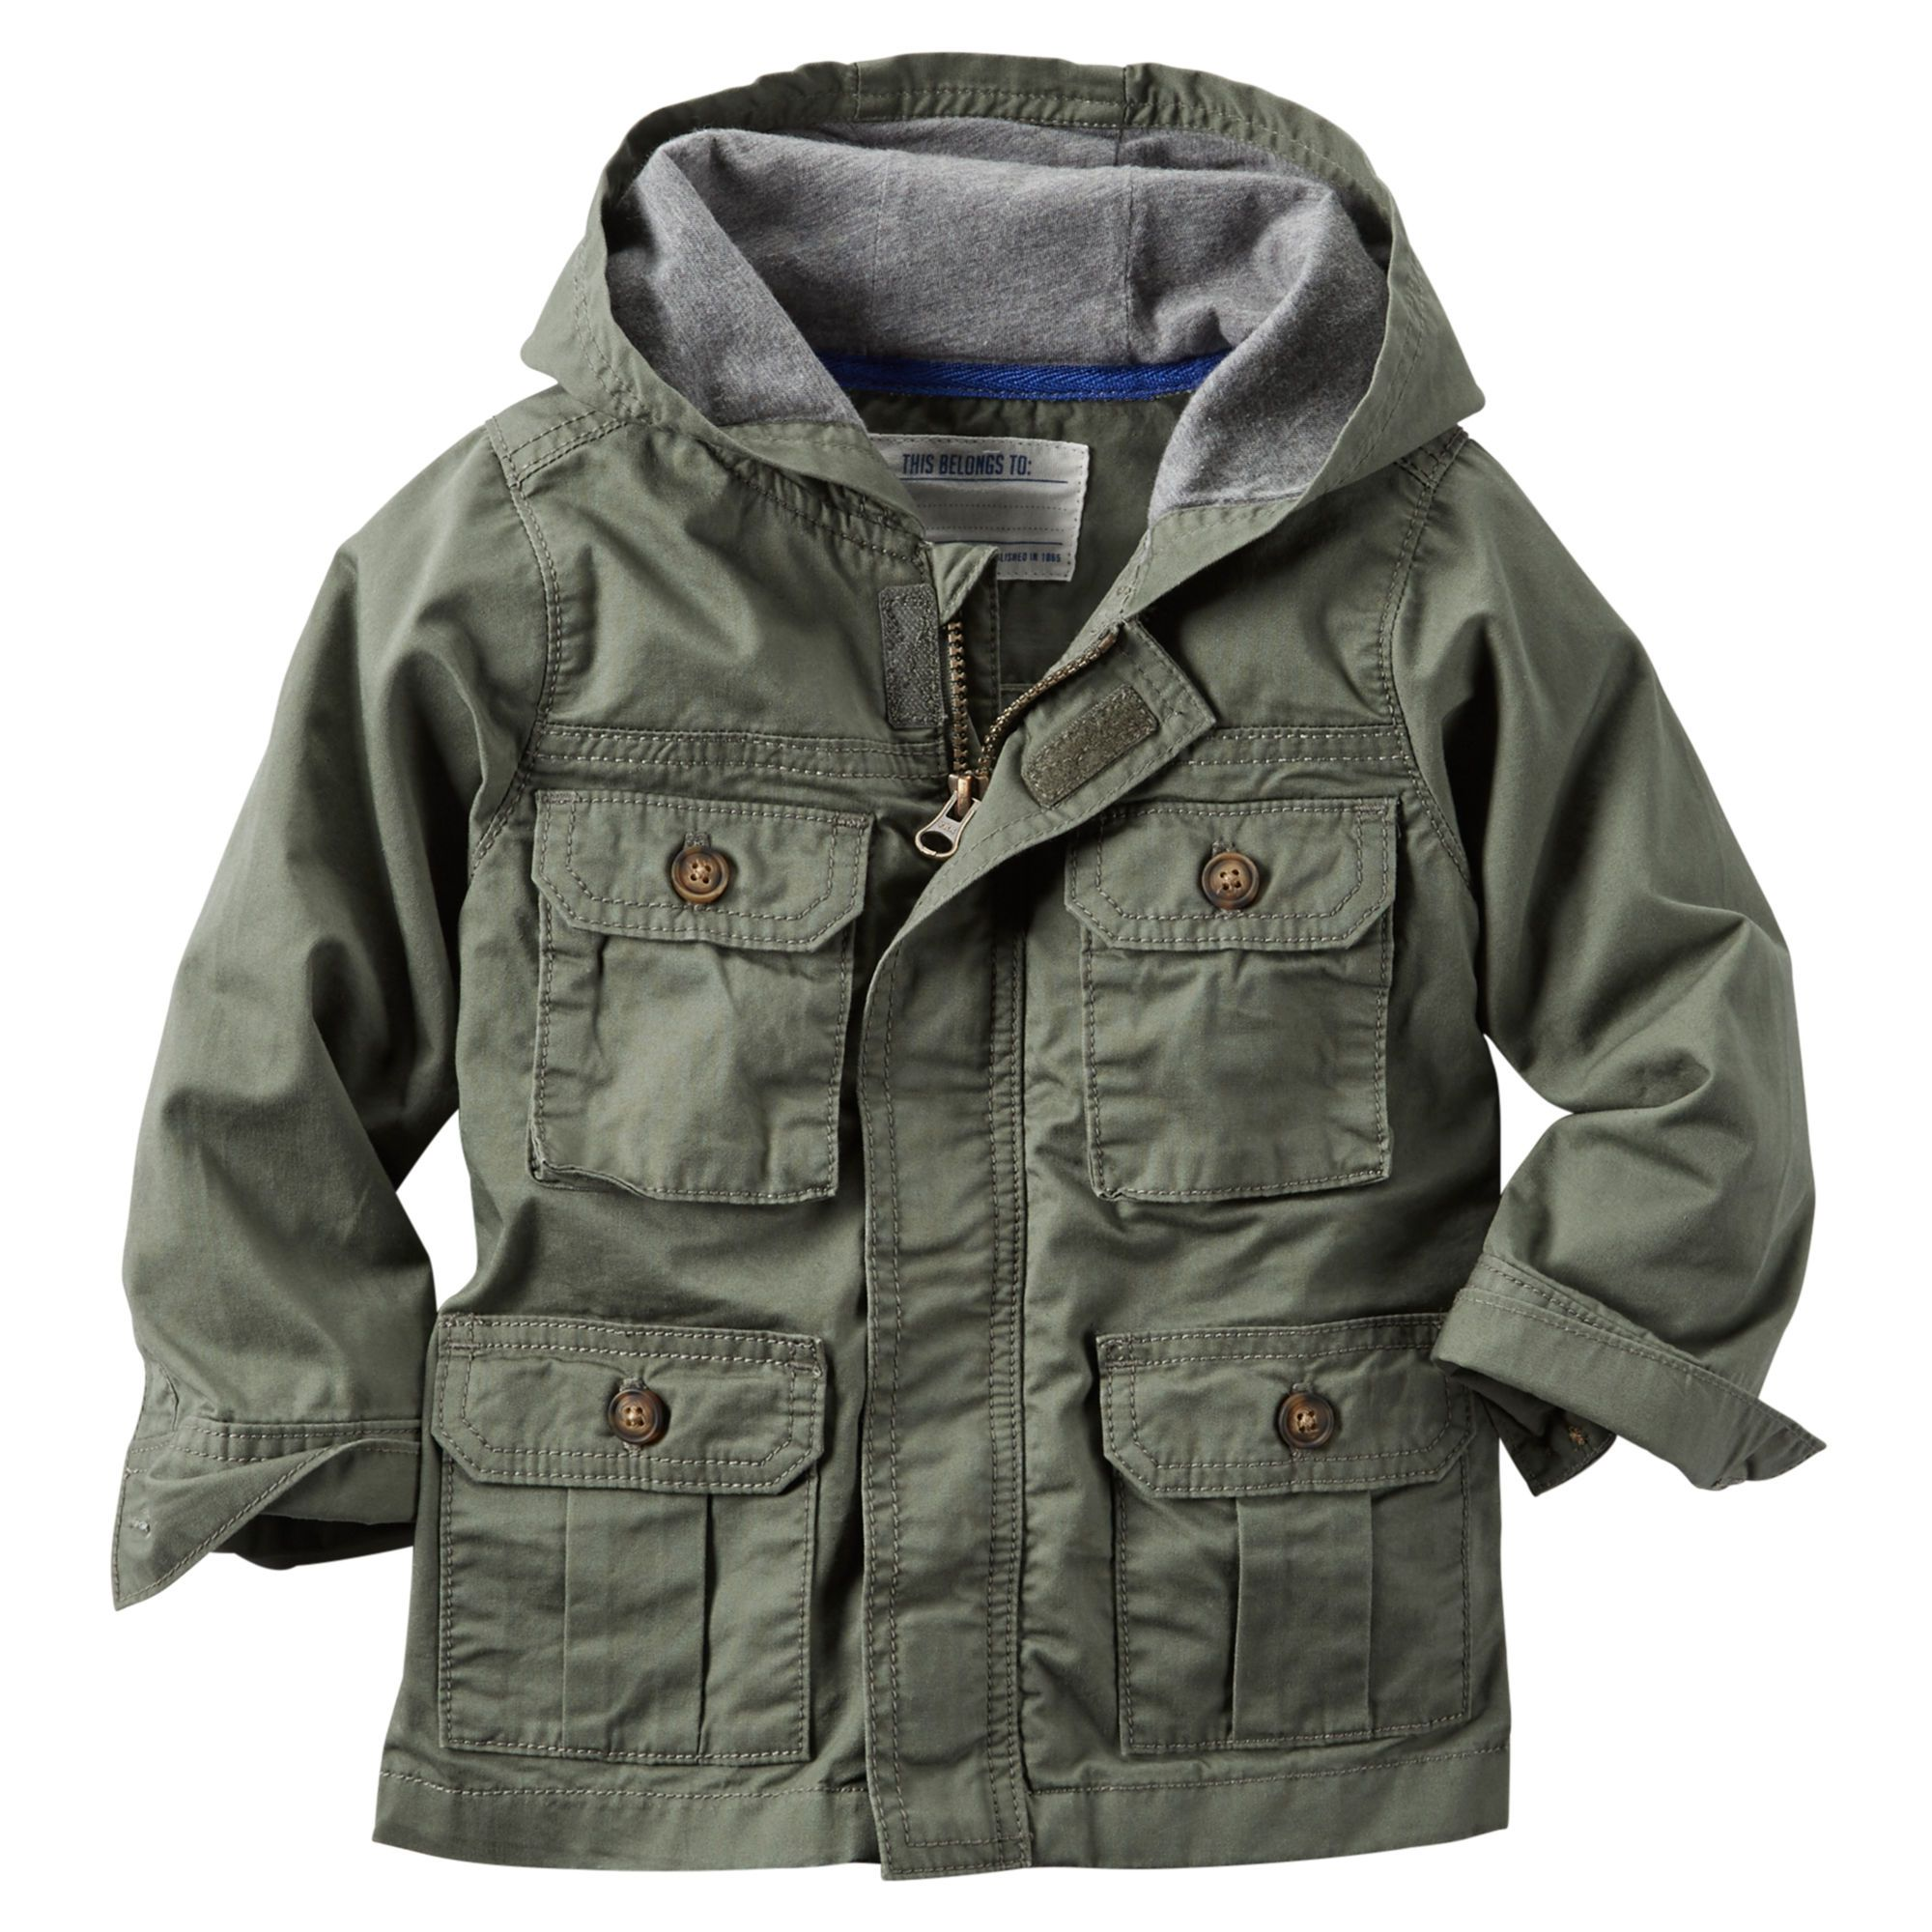 hooded twill cargo jacket cargo jacket baby boy stuff and babies #2: 159b58fa64a795f9e9e4f25e5140de70